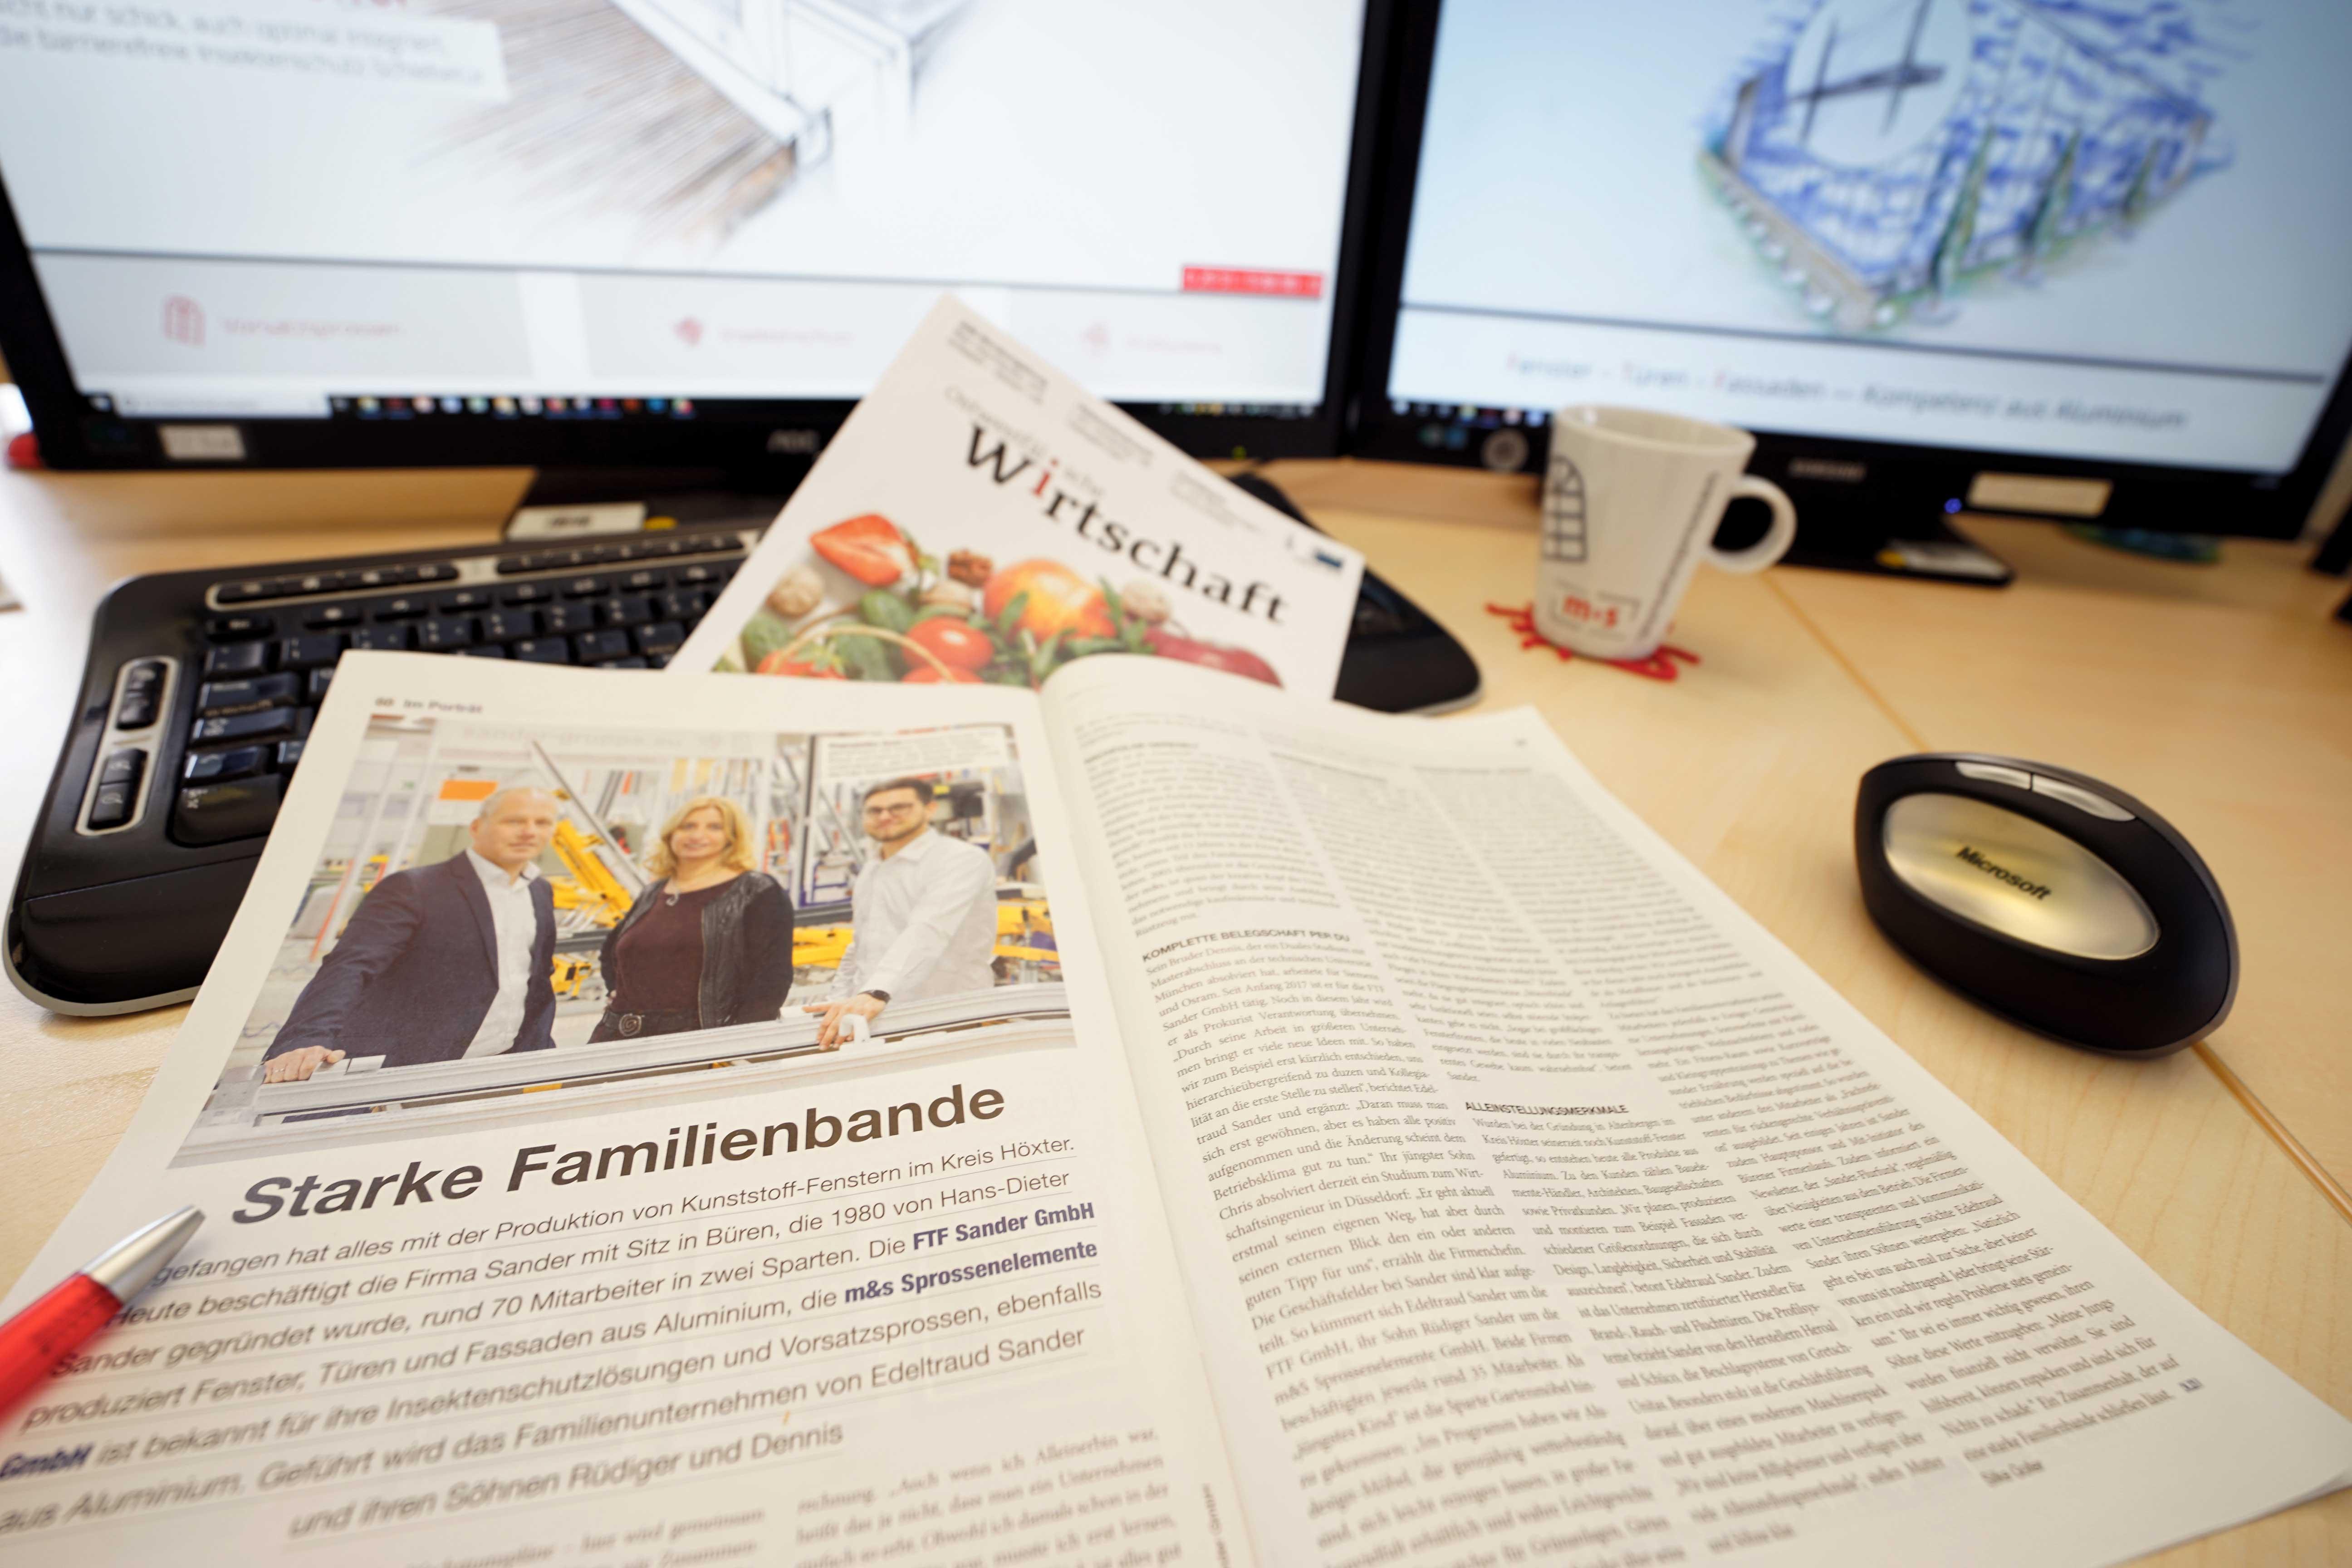 Sander Unternehmensgruppe - starke Familienbande